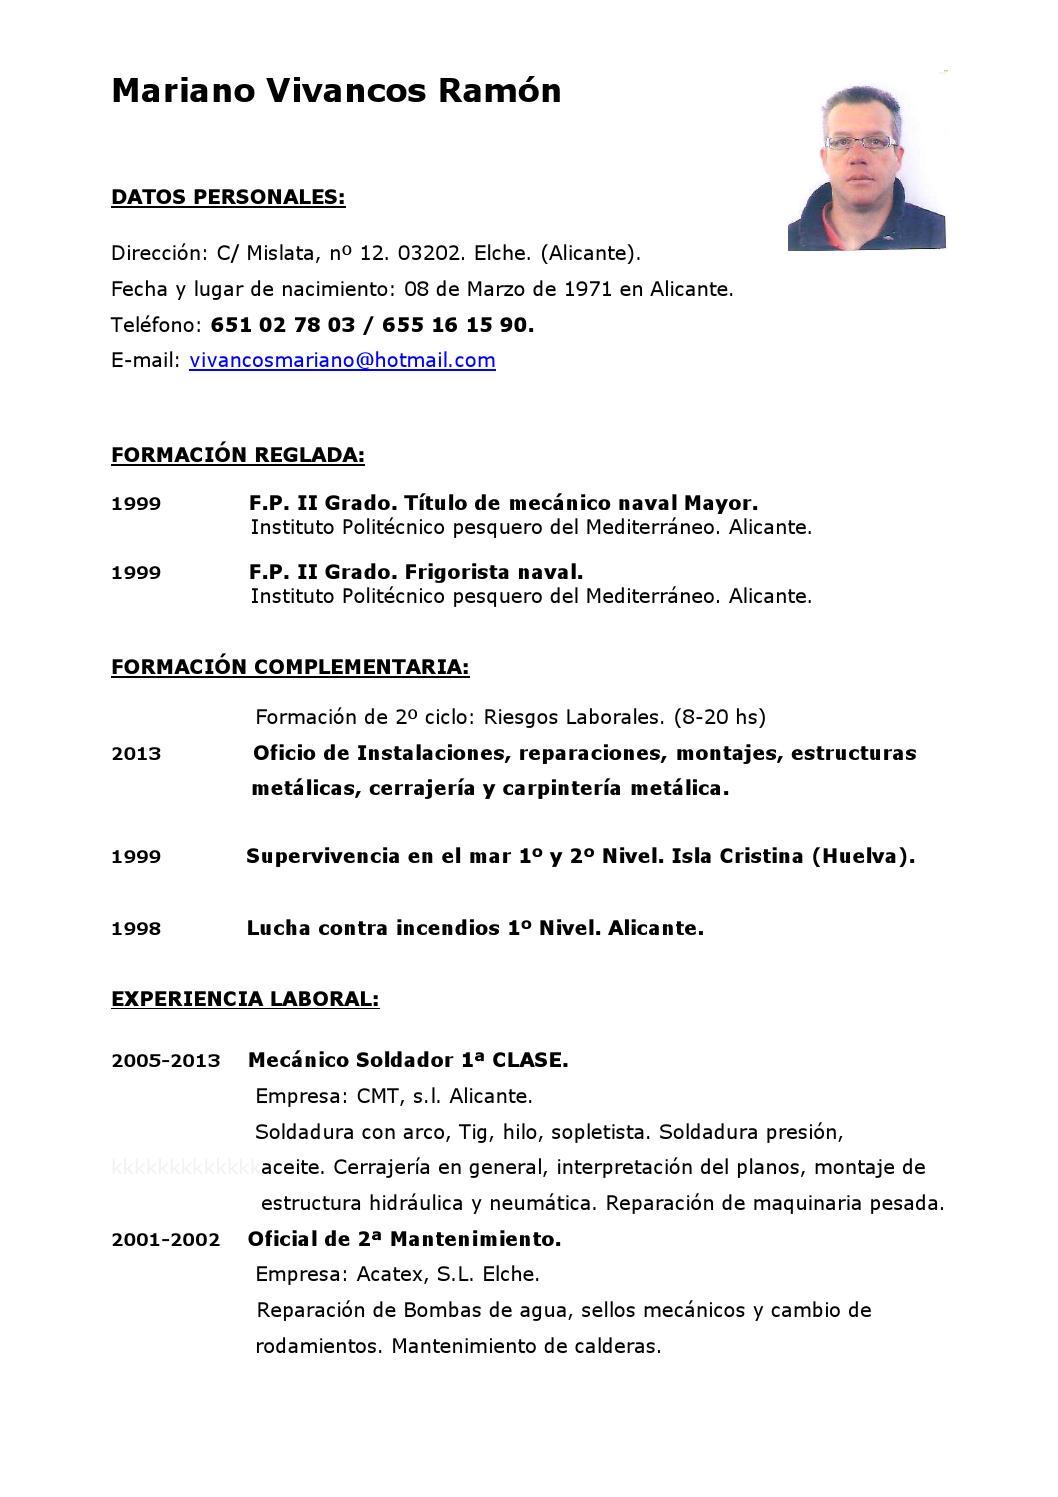 Excepcional Curriculum Vitae Para El Supervisor Del Soldador Imagen ...